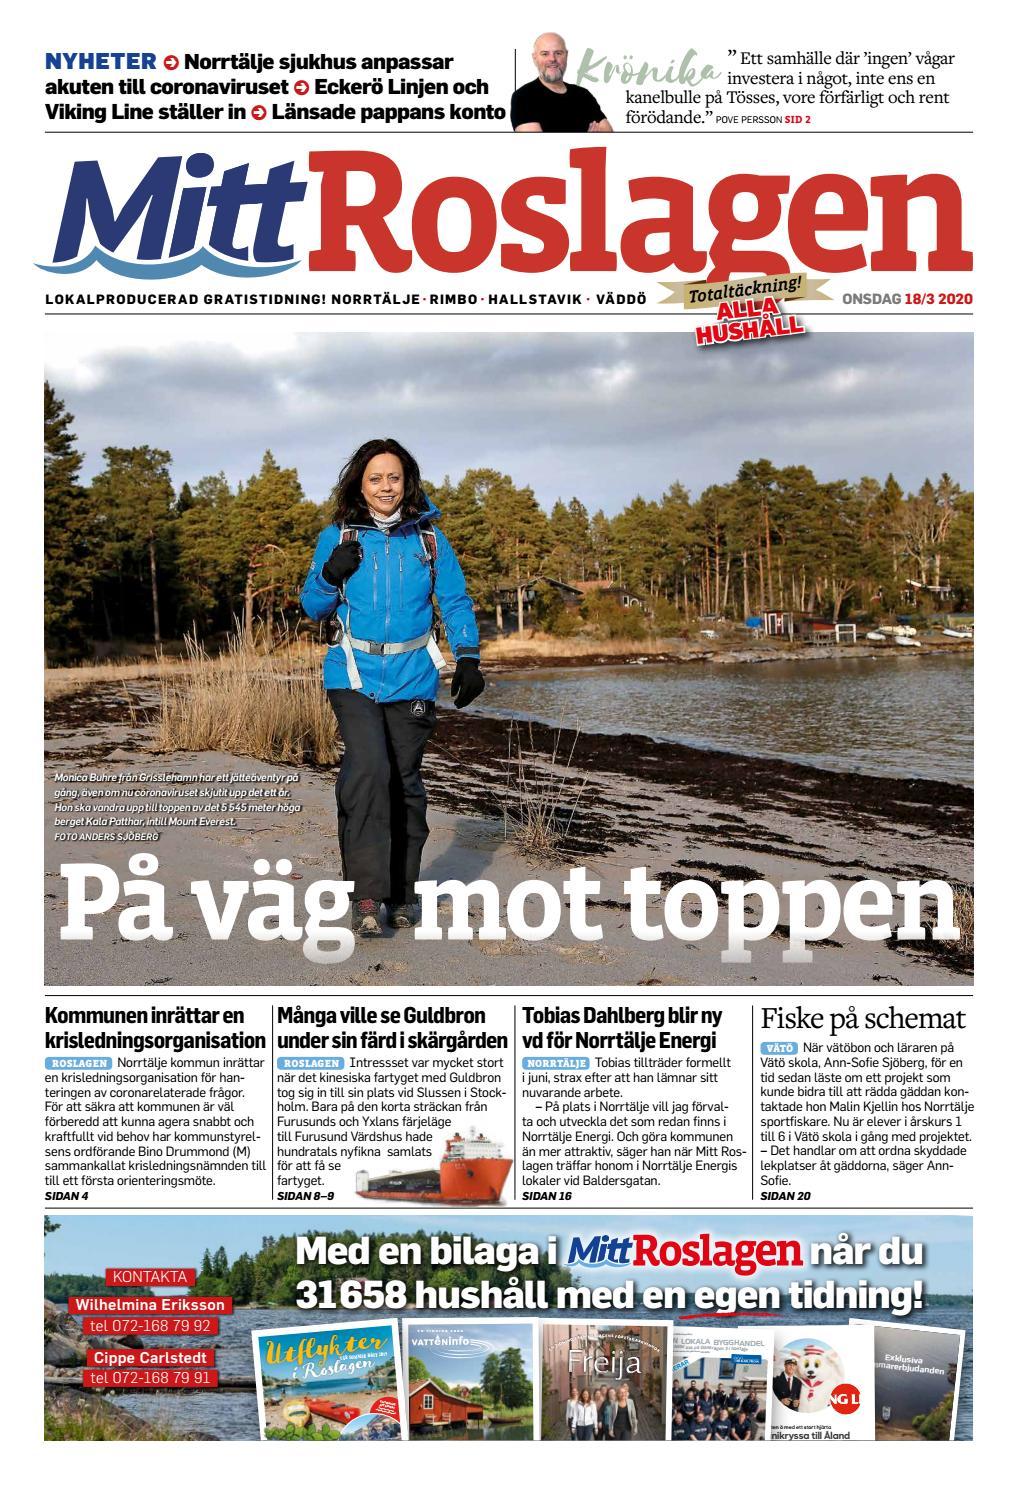 Favorit leder i borgmästarval – Supernytt – Aftonbladet live